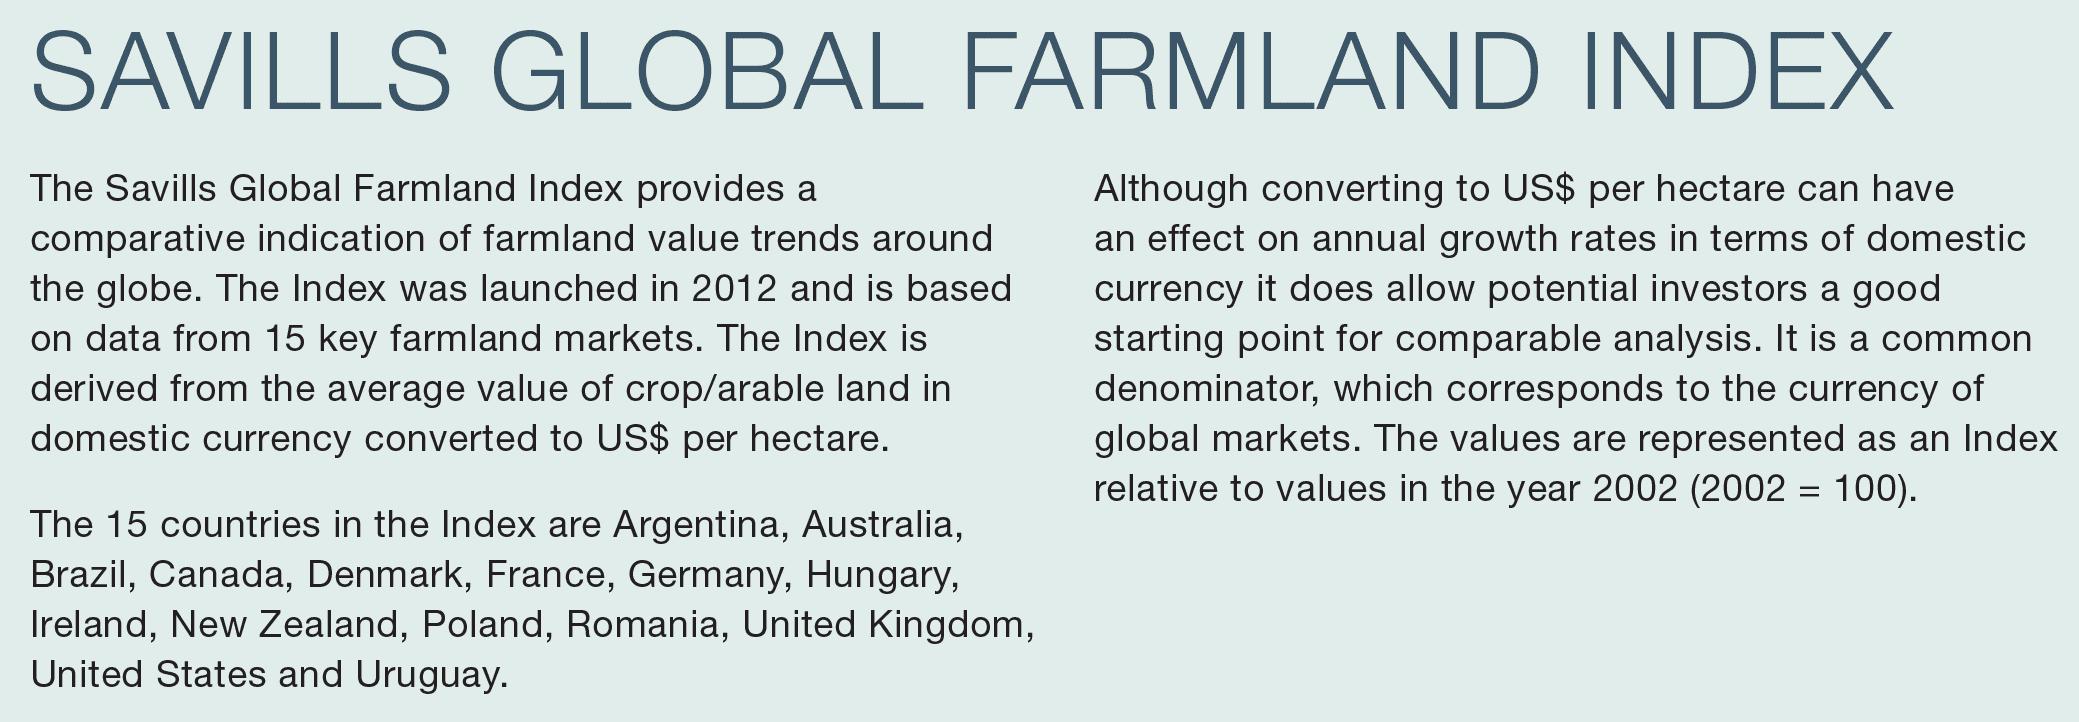 kamaco Global Farmland Index